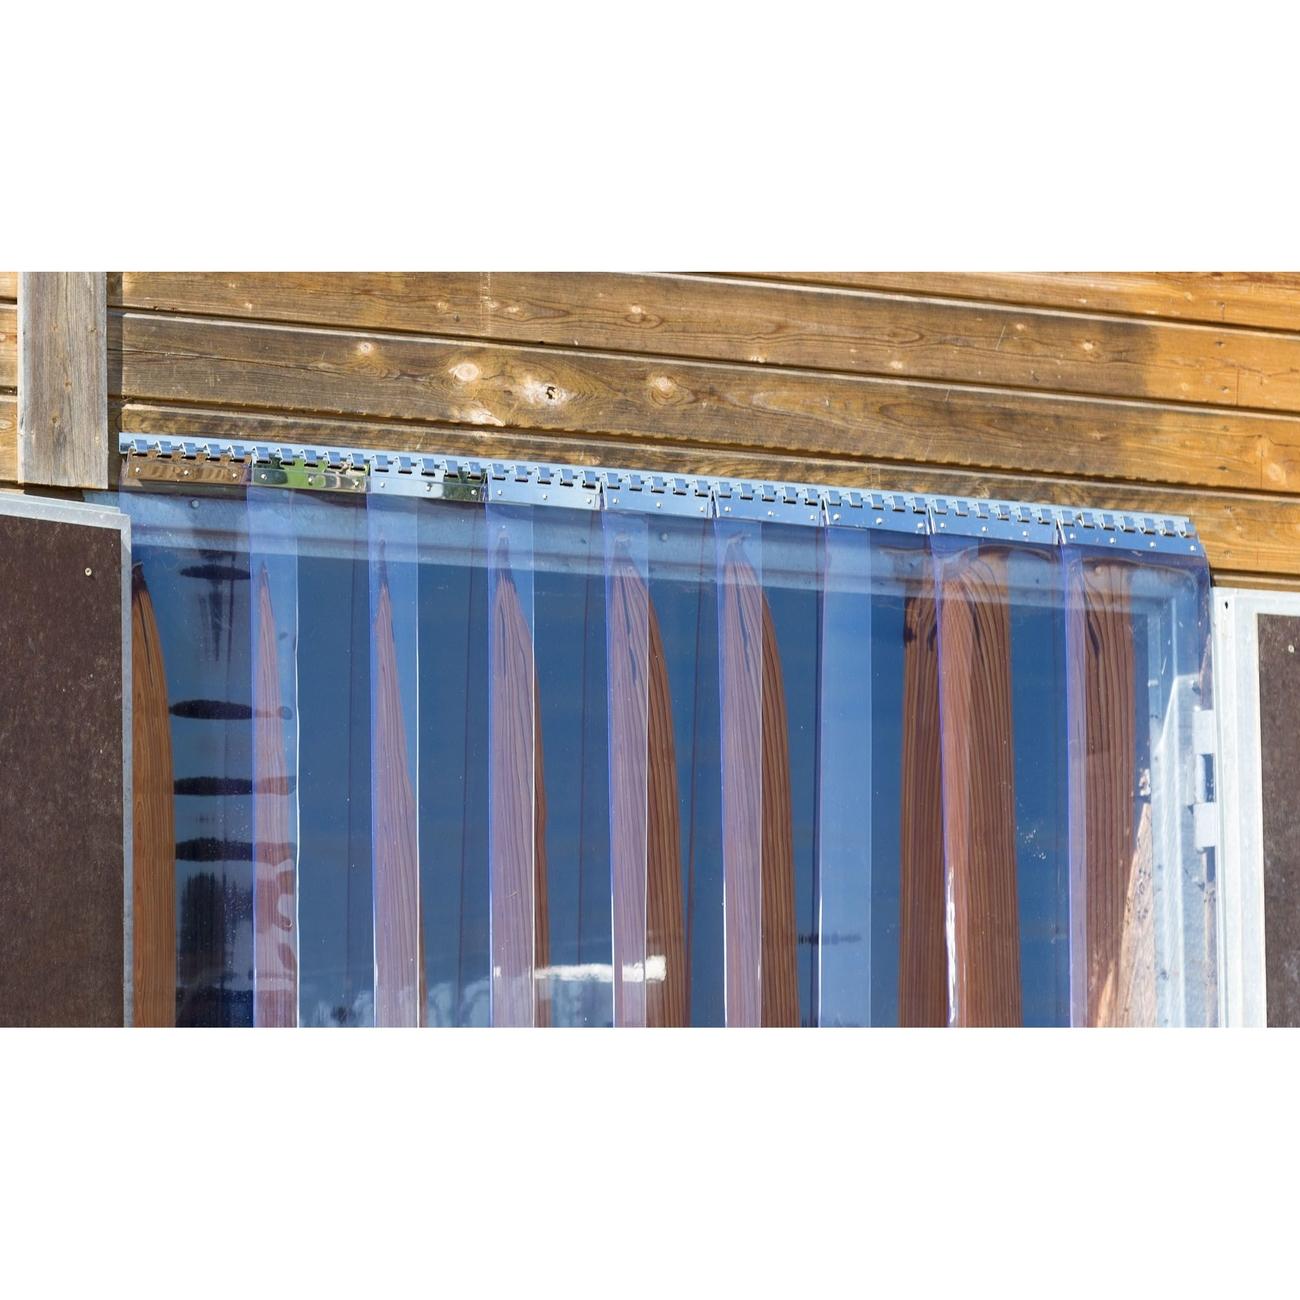 Kerbl PVC-Streifenvorhang, Bild 7